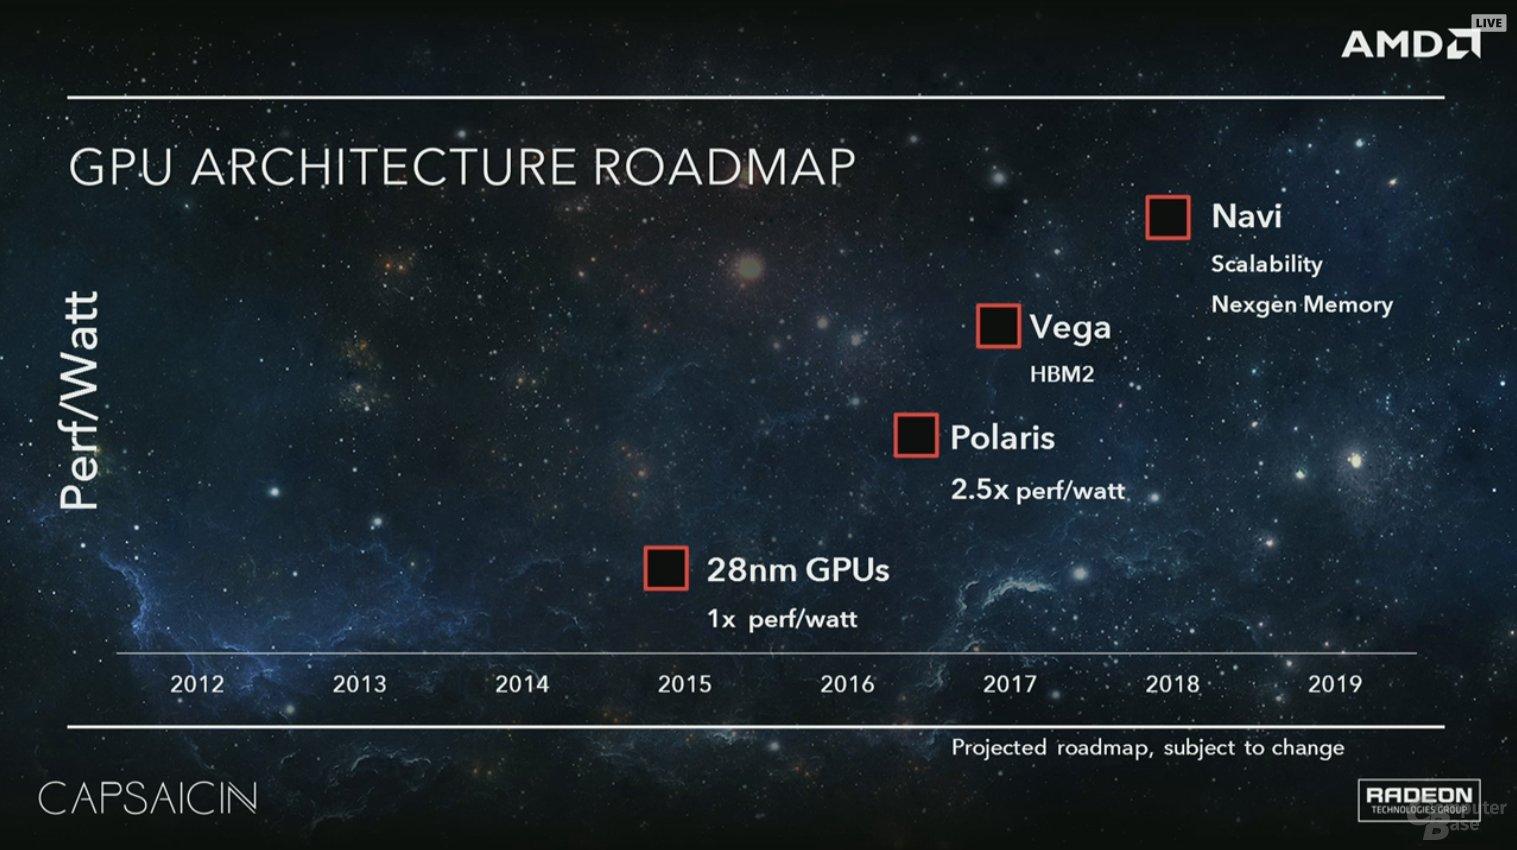 GPU-Architektur-Roadmap mit Polaris, Vega und Navi